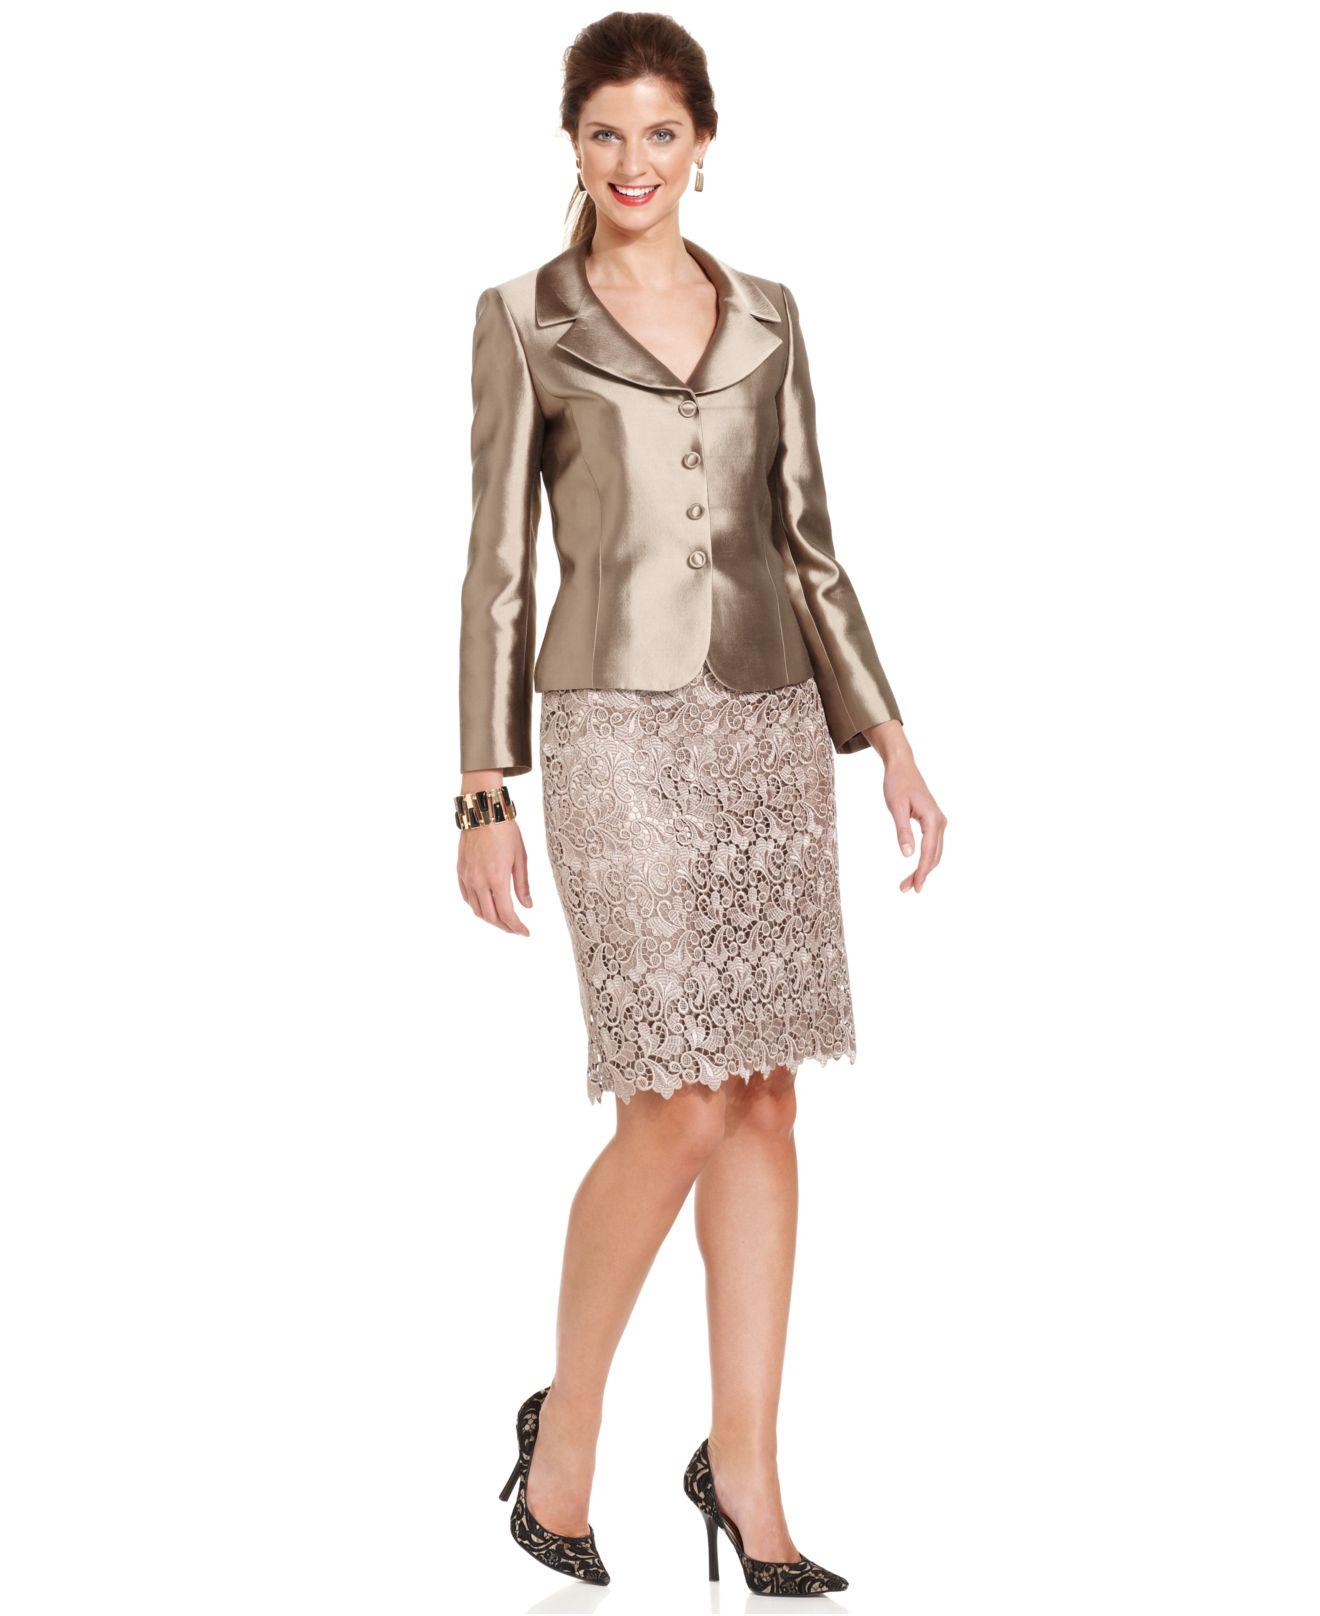 ebf83c1415b8 Tahari Three-button Metallic Lace Skirt Suit in Brown - Lyst